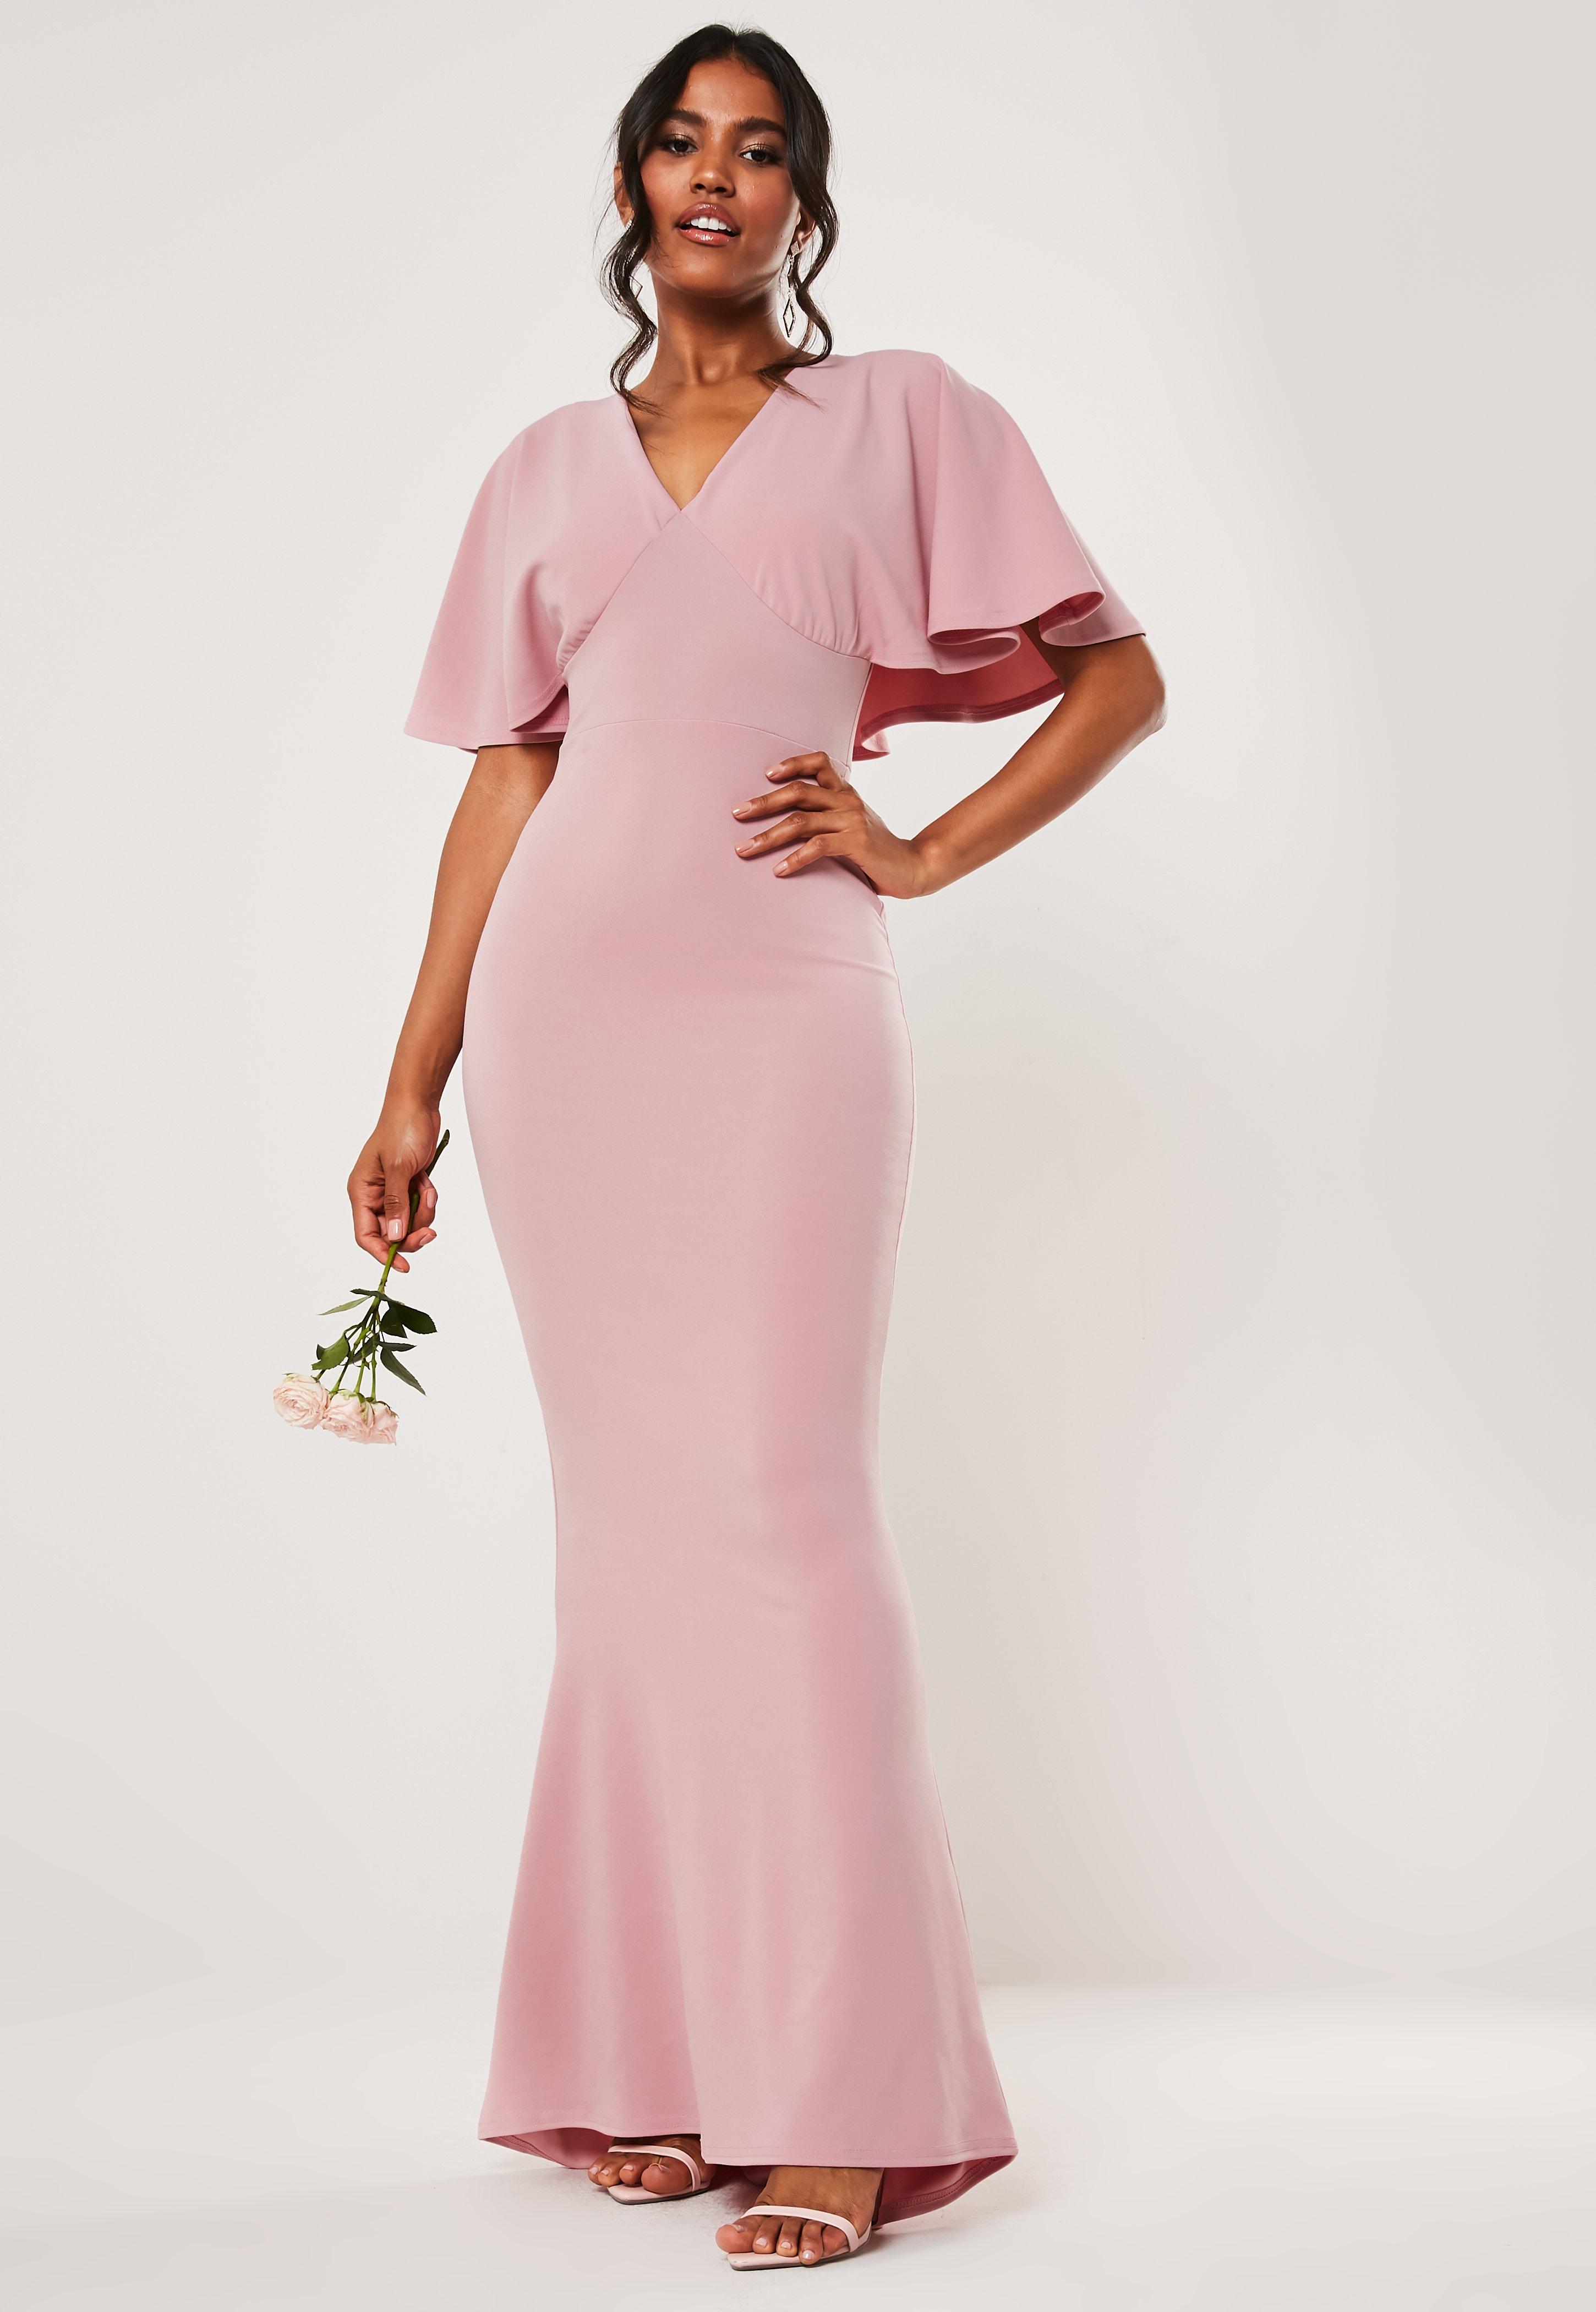 c5c585dc37 Petite Bridesmaid Pink Cape Sleeve V Neck Fishtail Maxi Dress